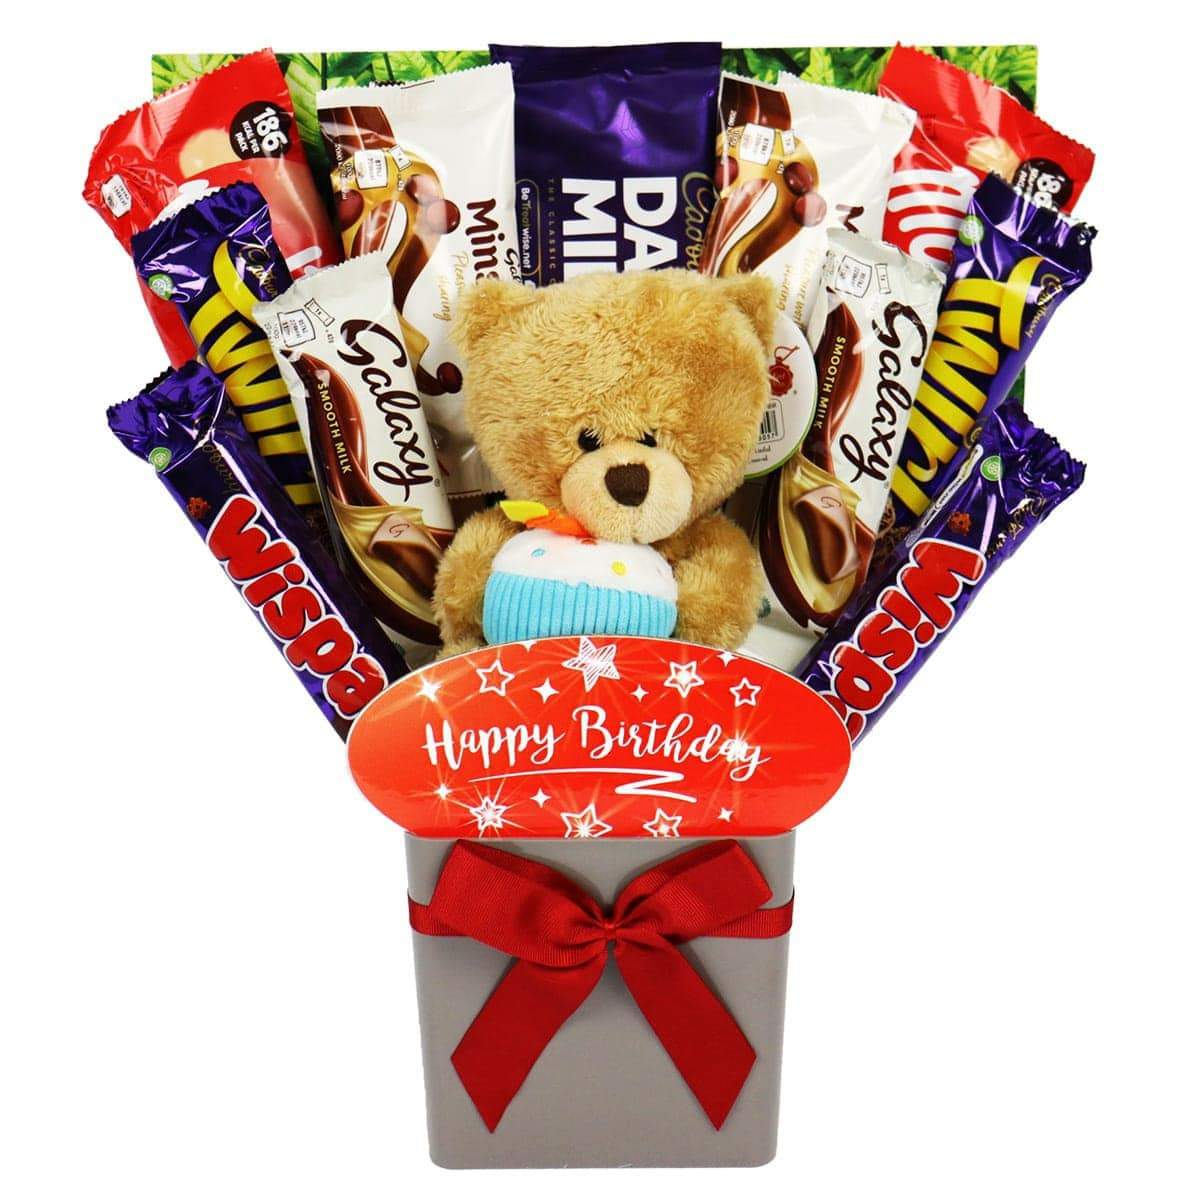 The 'Happy Birthday' Teddy Bouquet